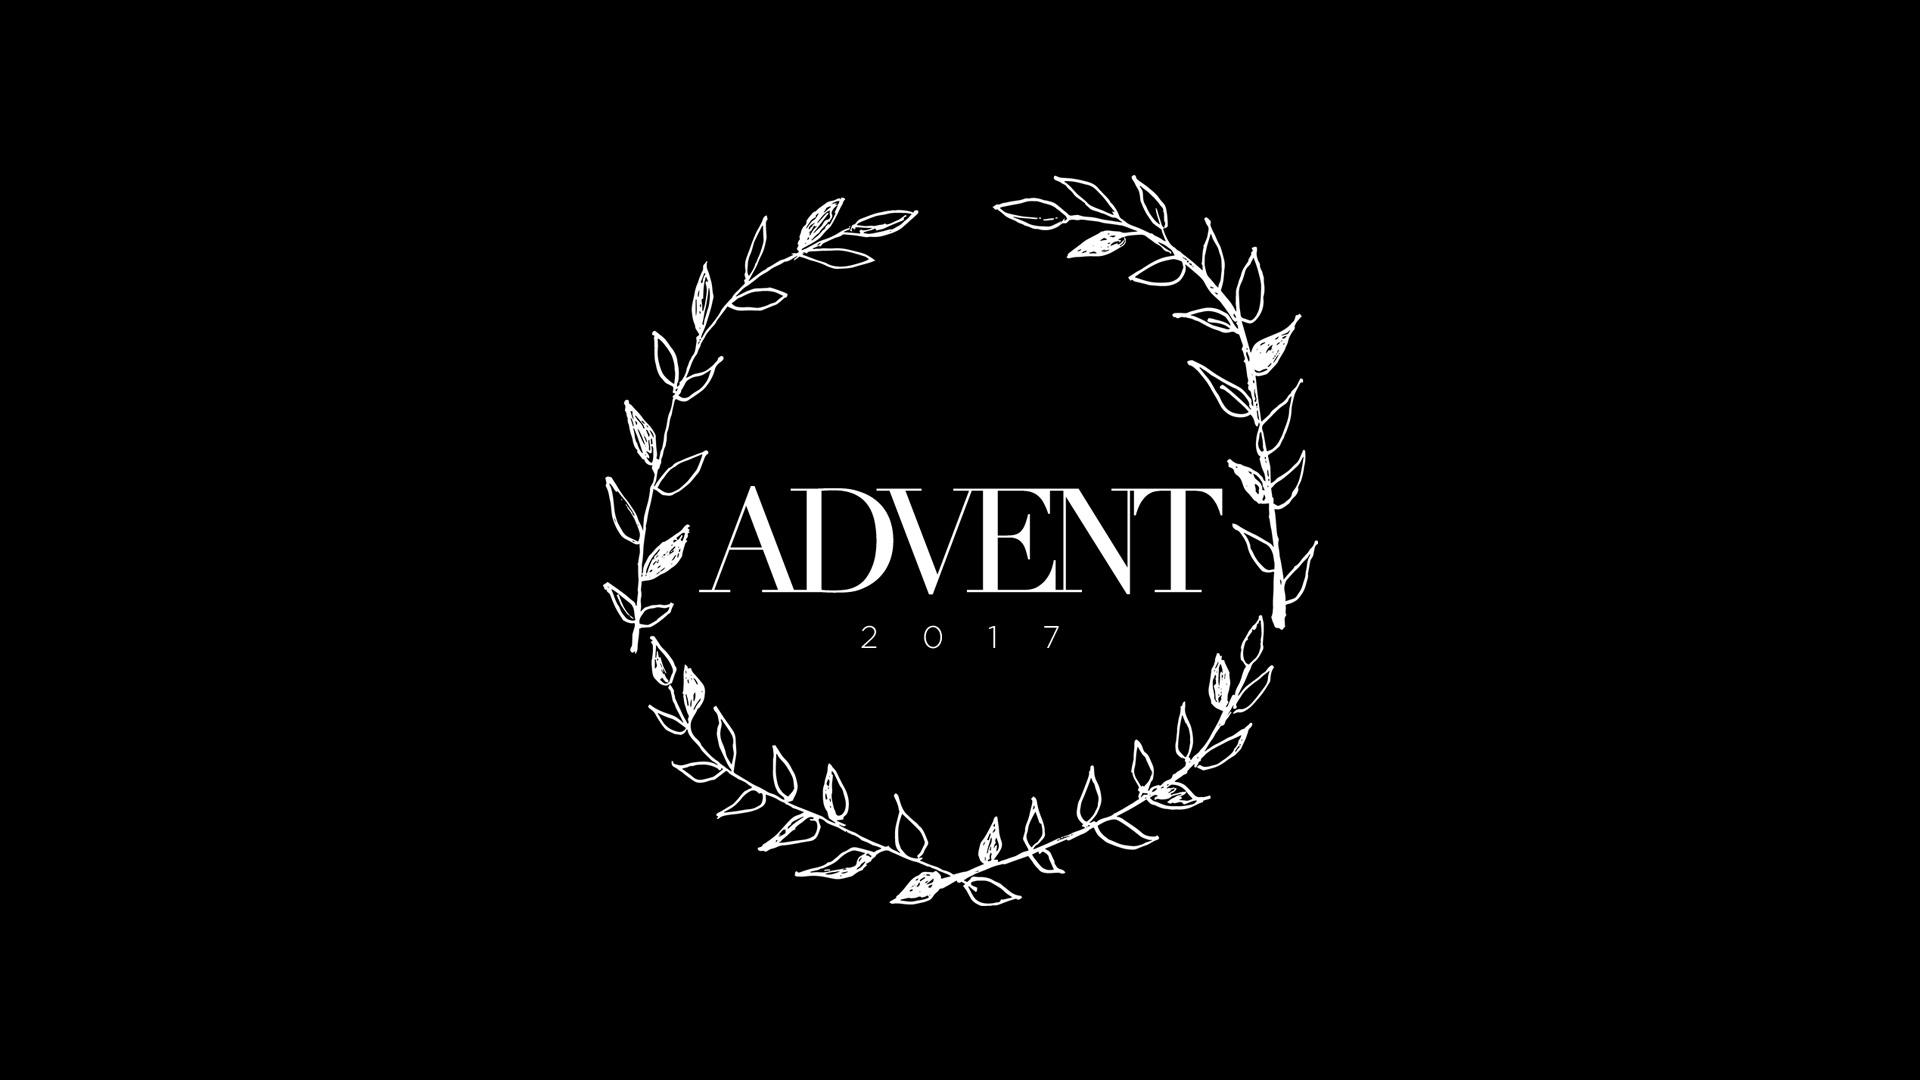 advent-2017-screens.jpg